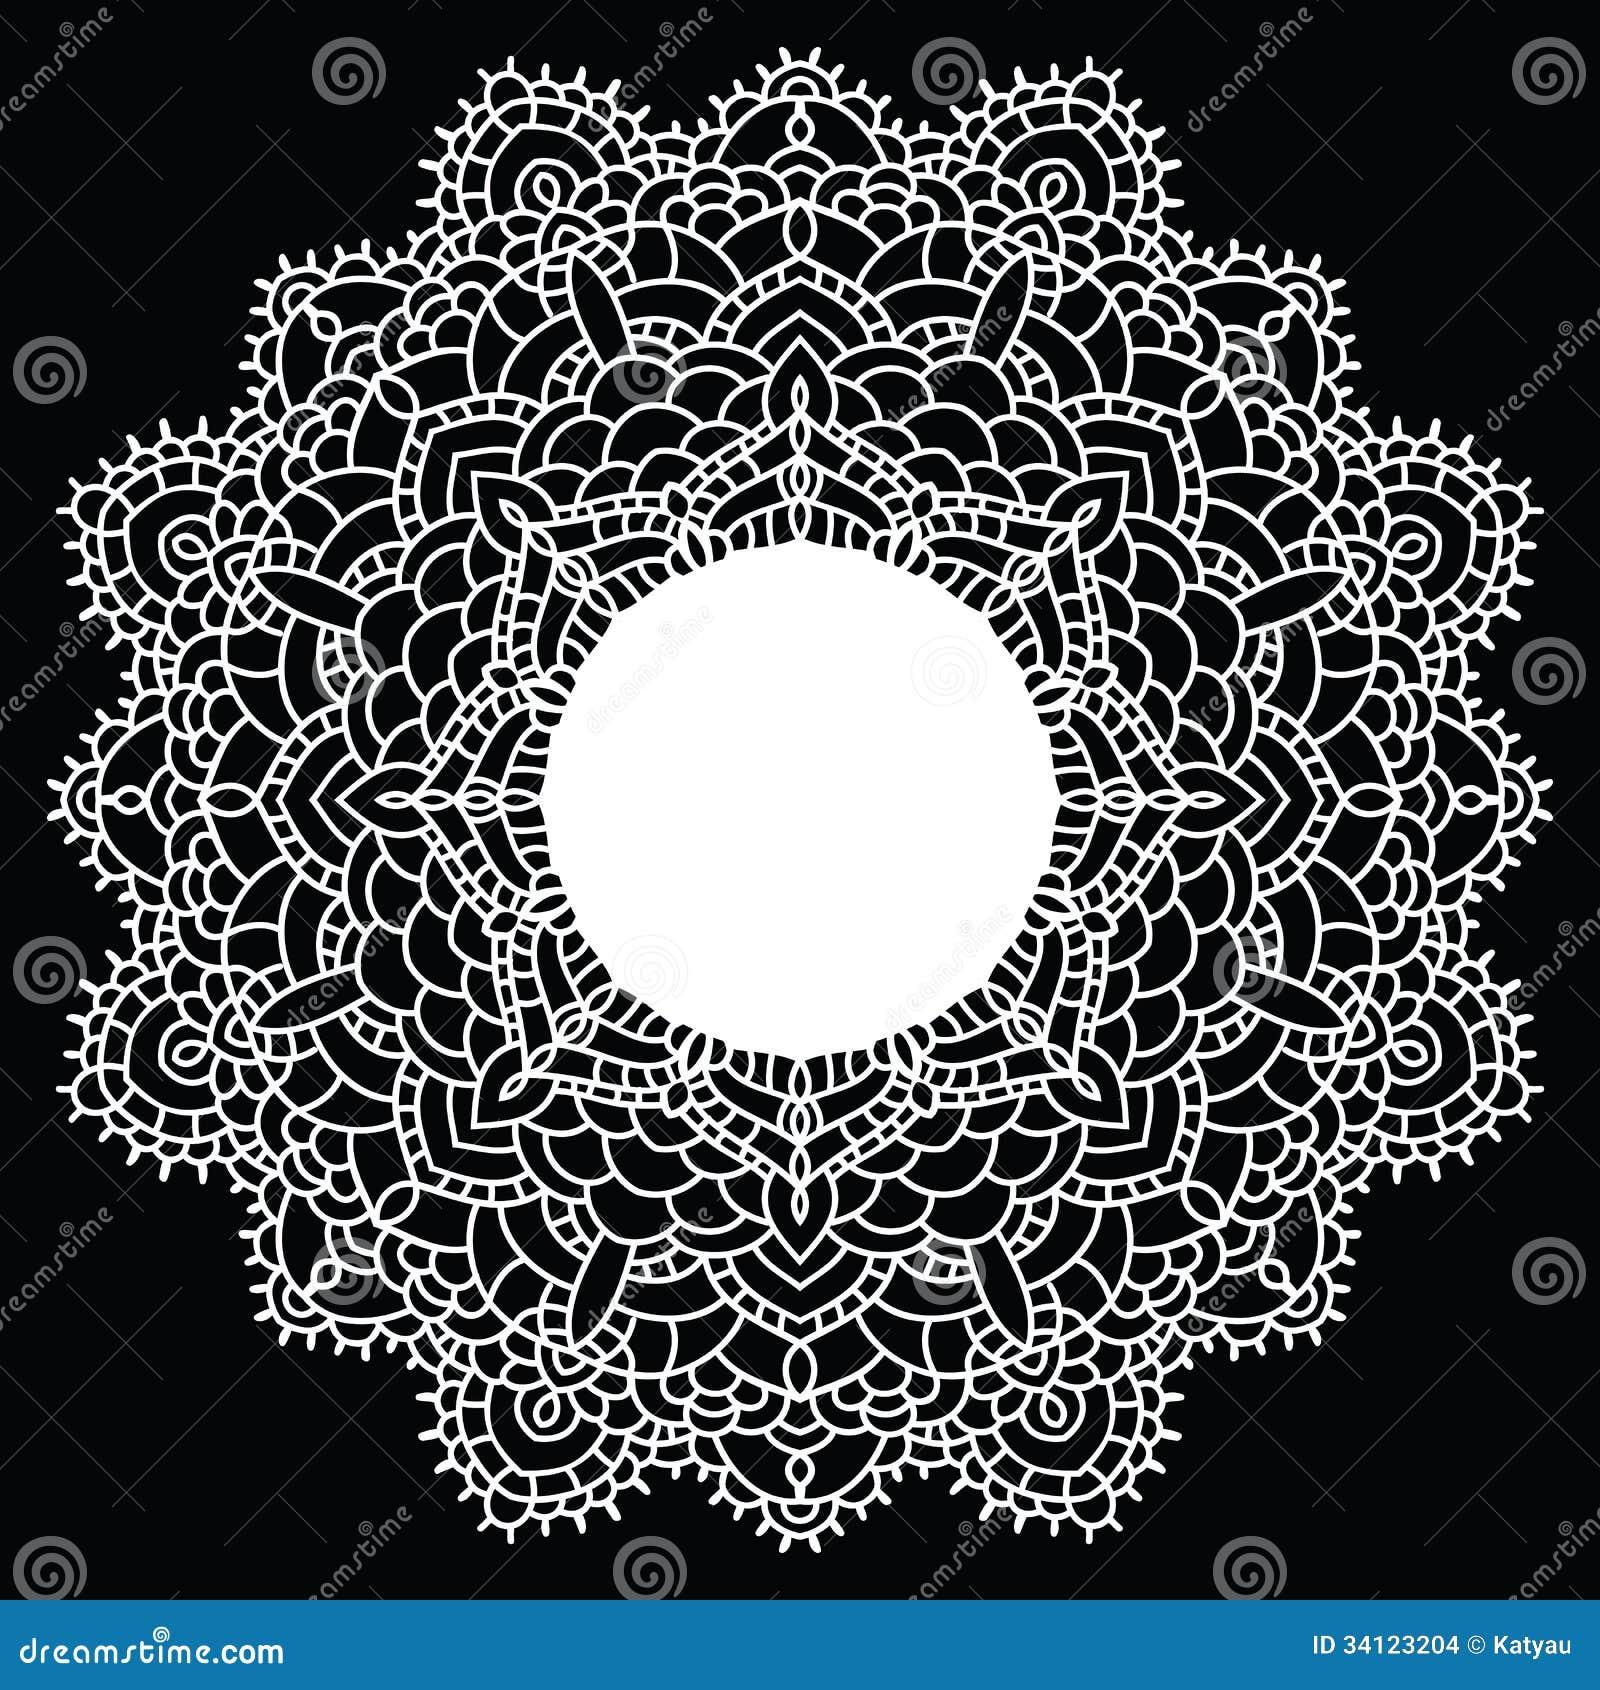 Crochet Patterns Vector : Crochet Lace Mandala. Stock Images - Image: 34123204